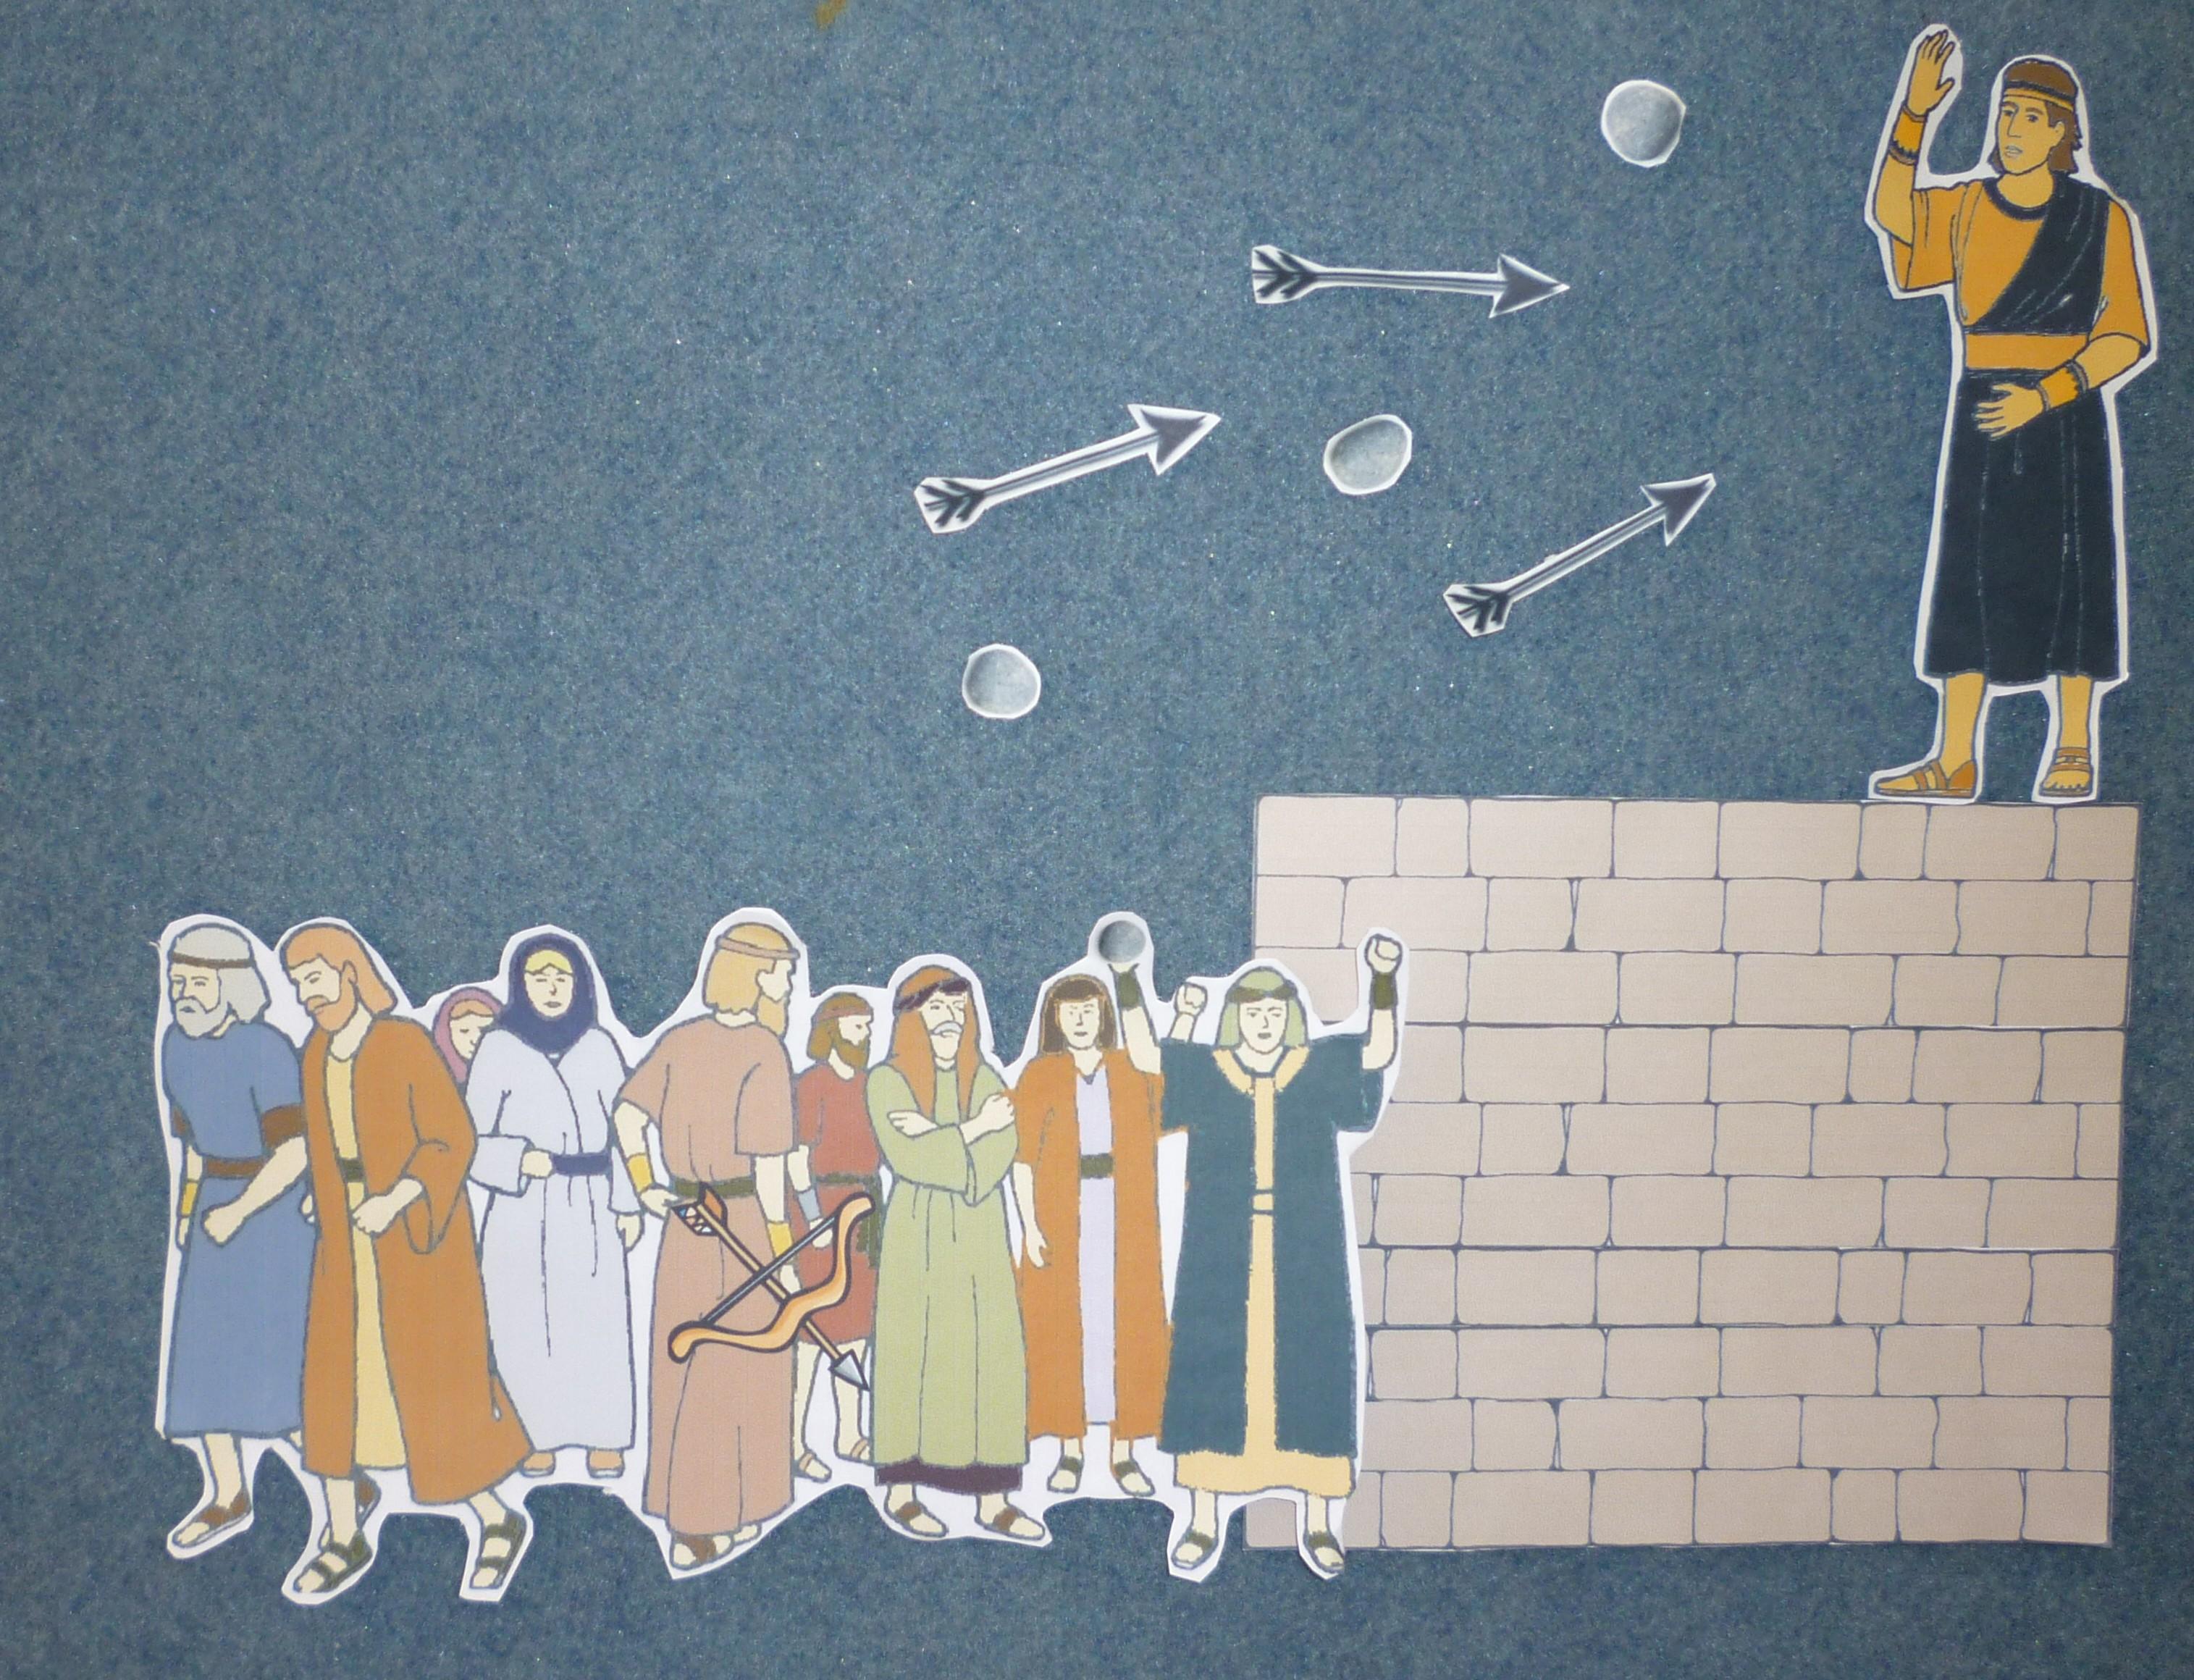 Samuel the lamanite clipart graphic royalty free stock Lesson 31: Samuel the Lamanite - Teaching Children graphic royalty free stock